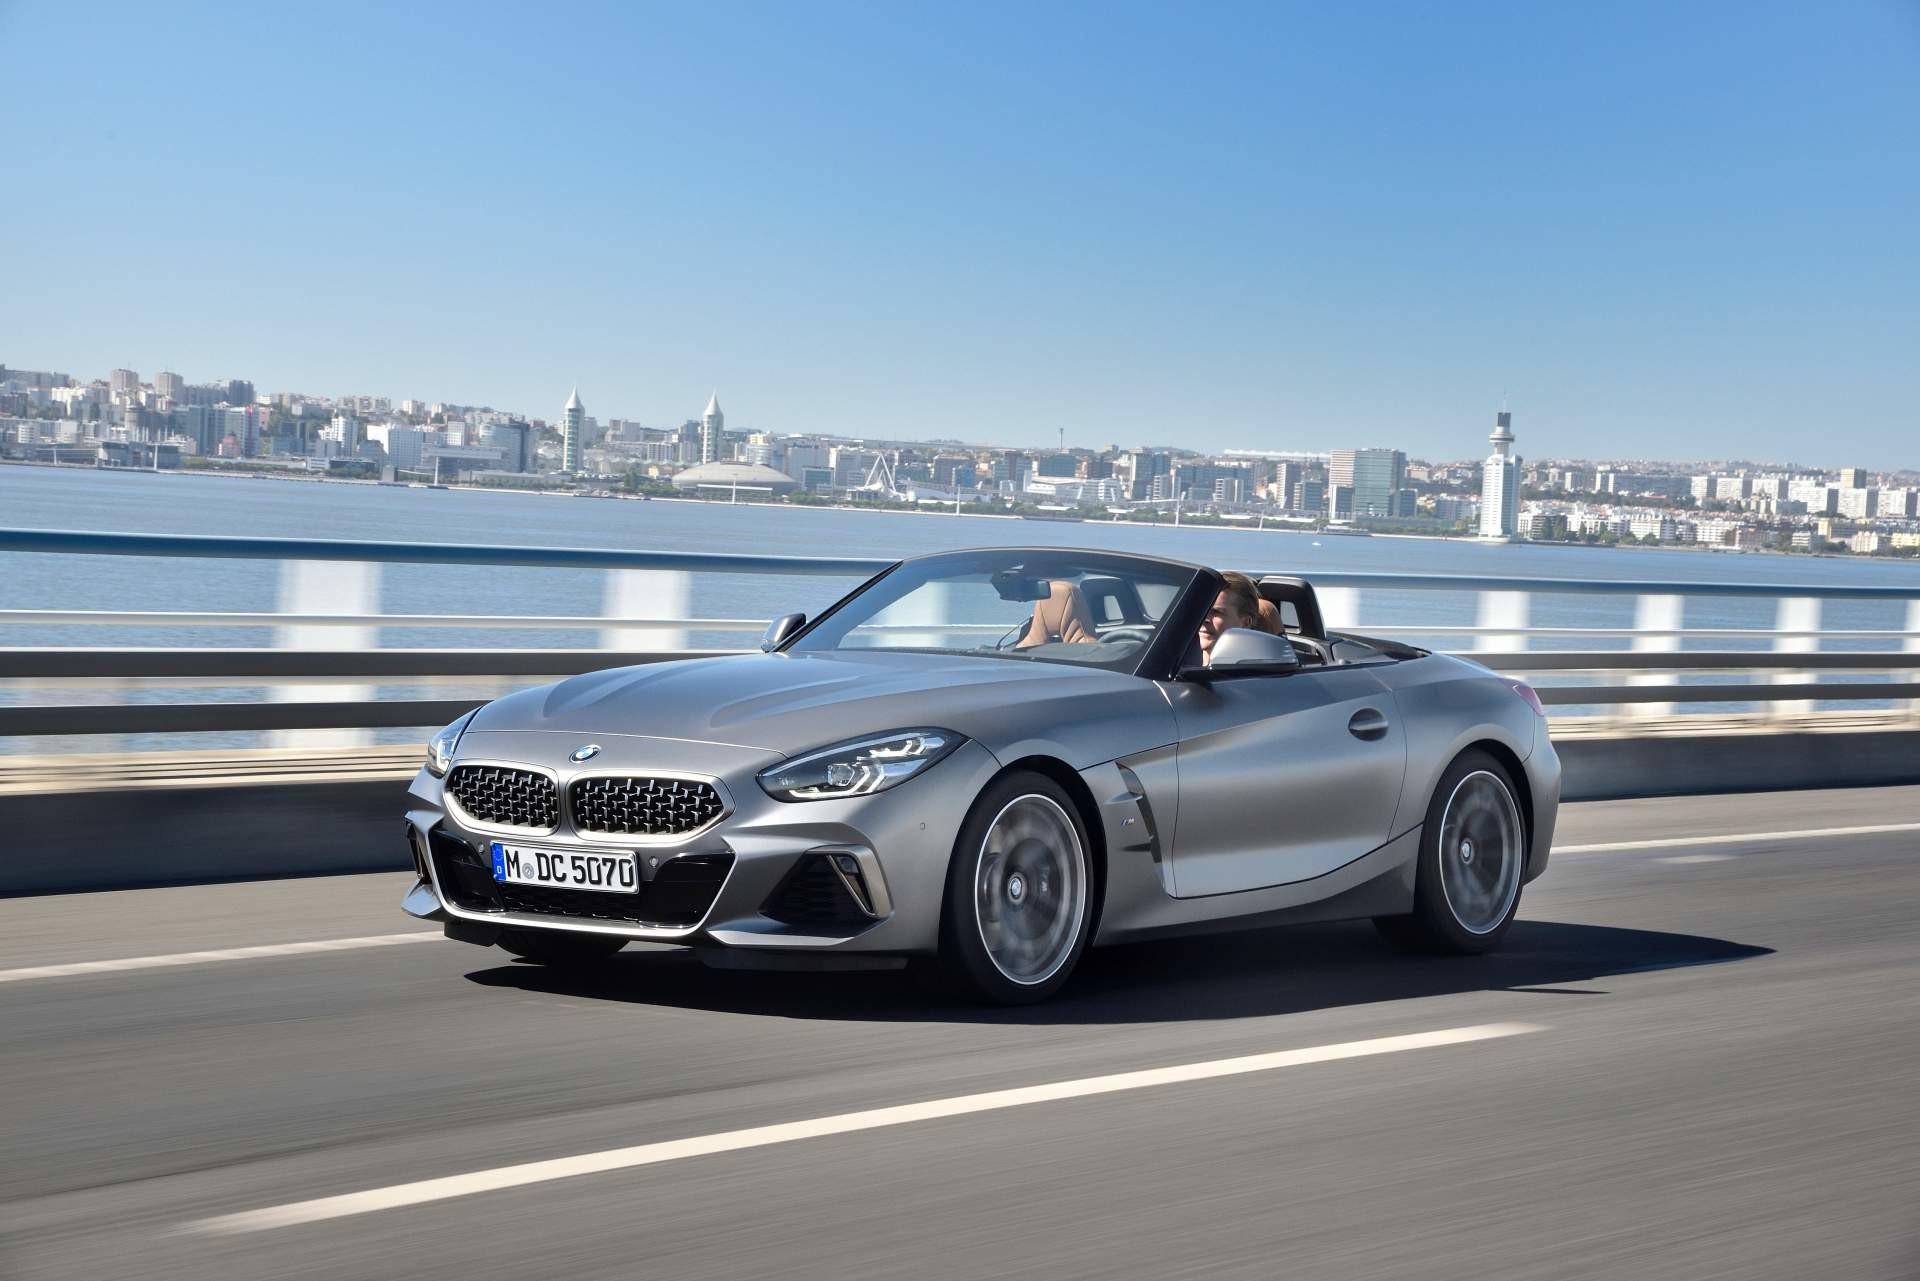 Foto de BMW Z4 M40i 2019 (2/84)